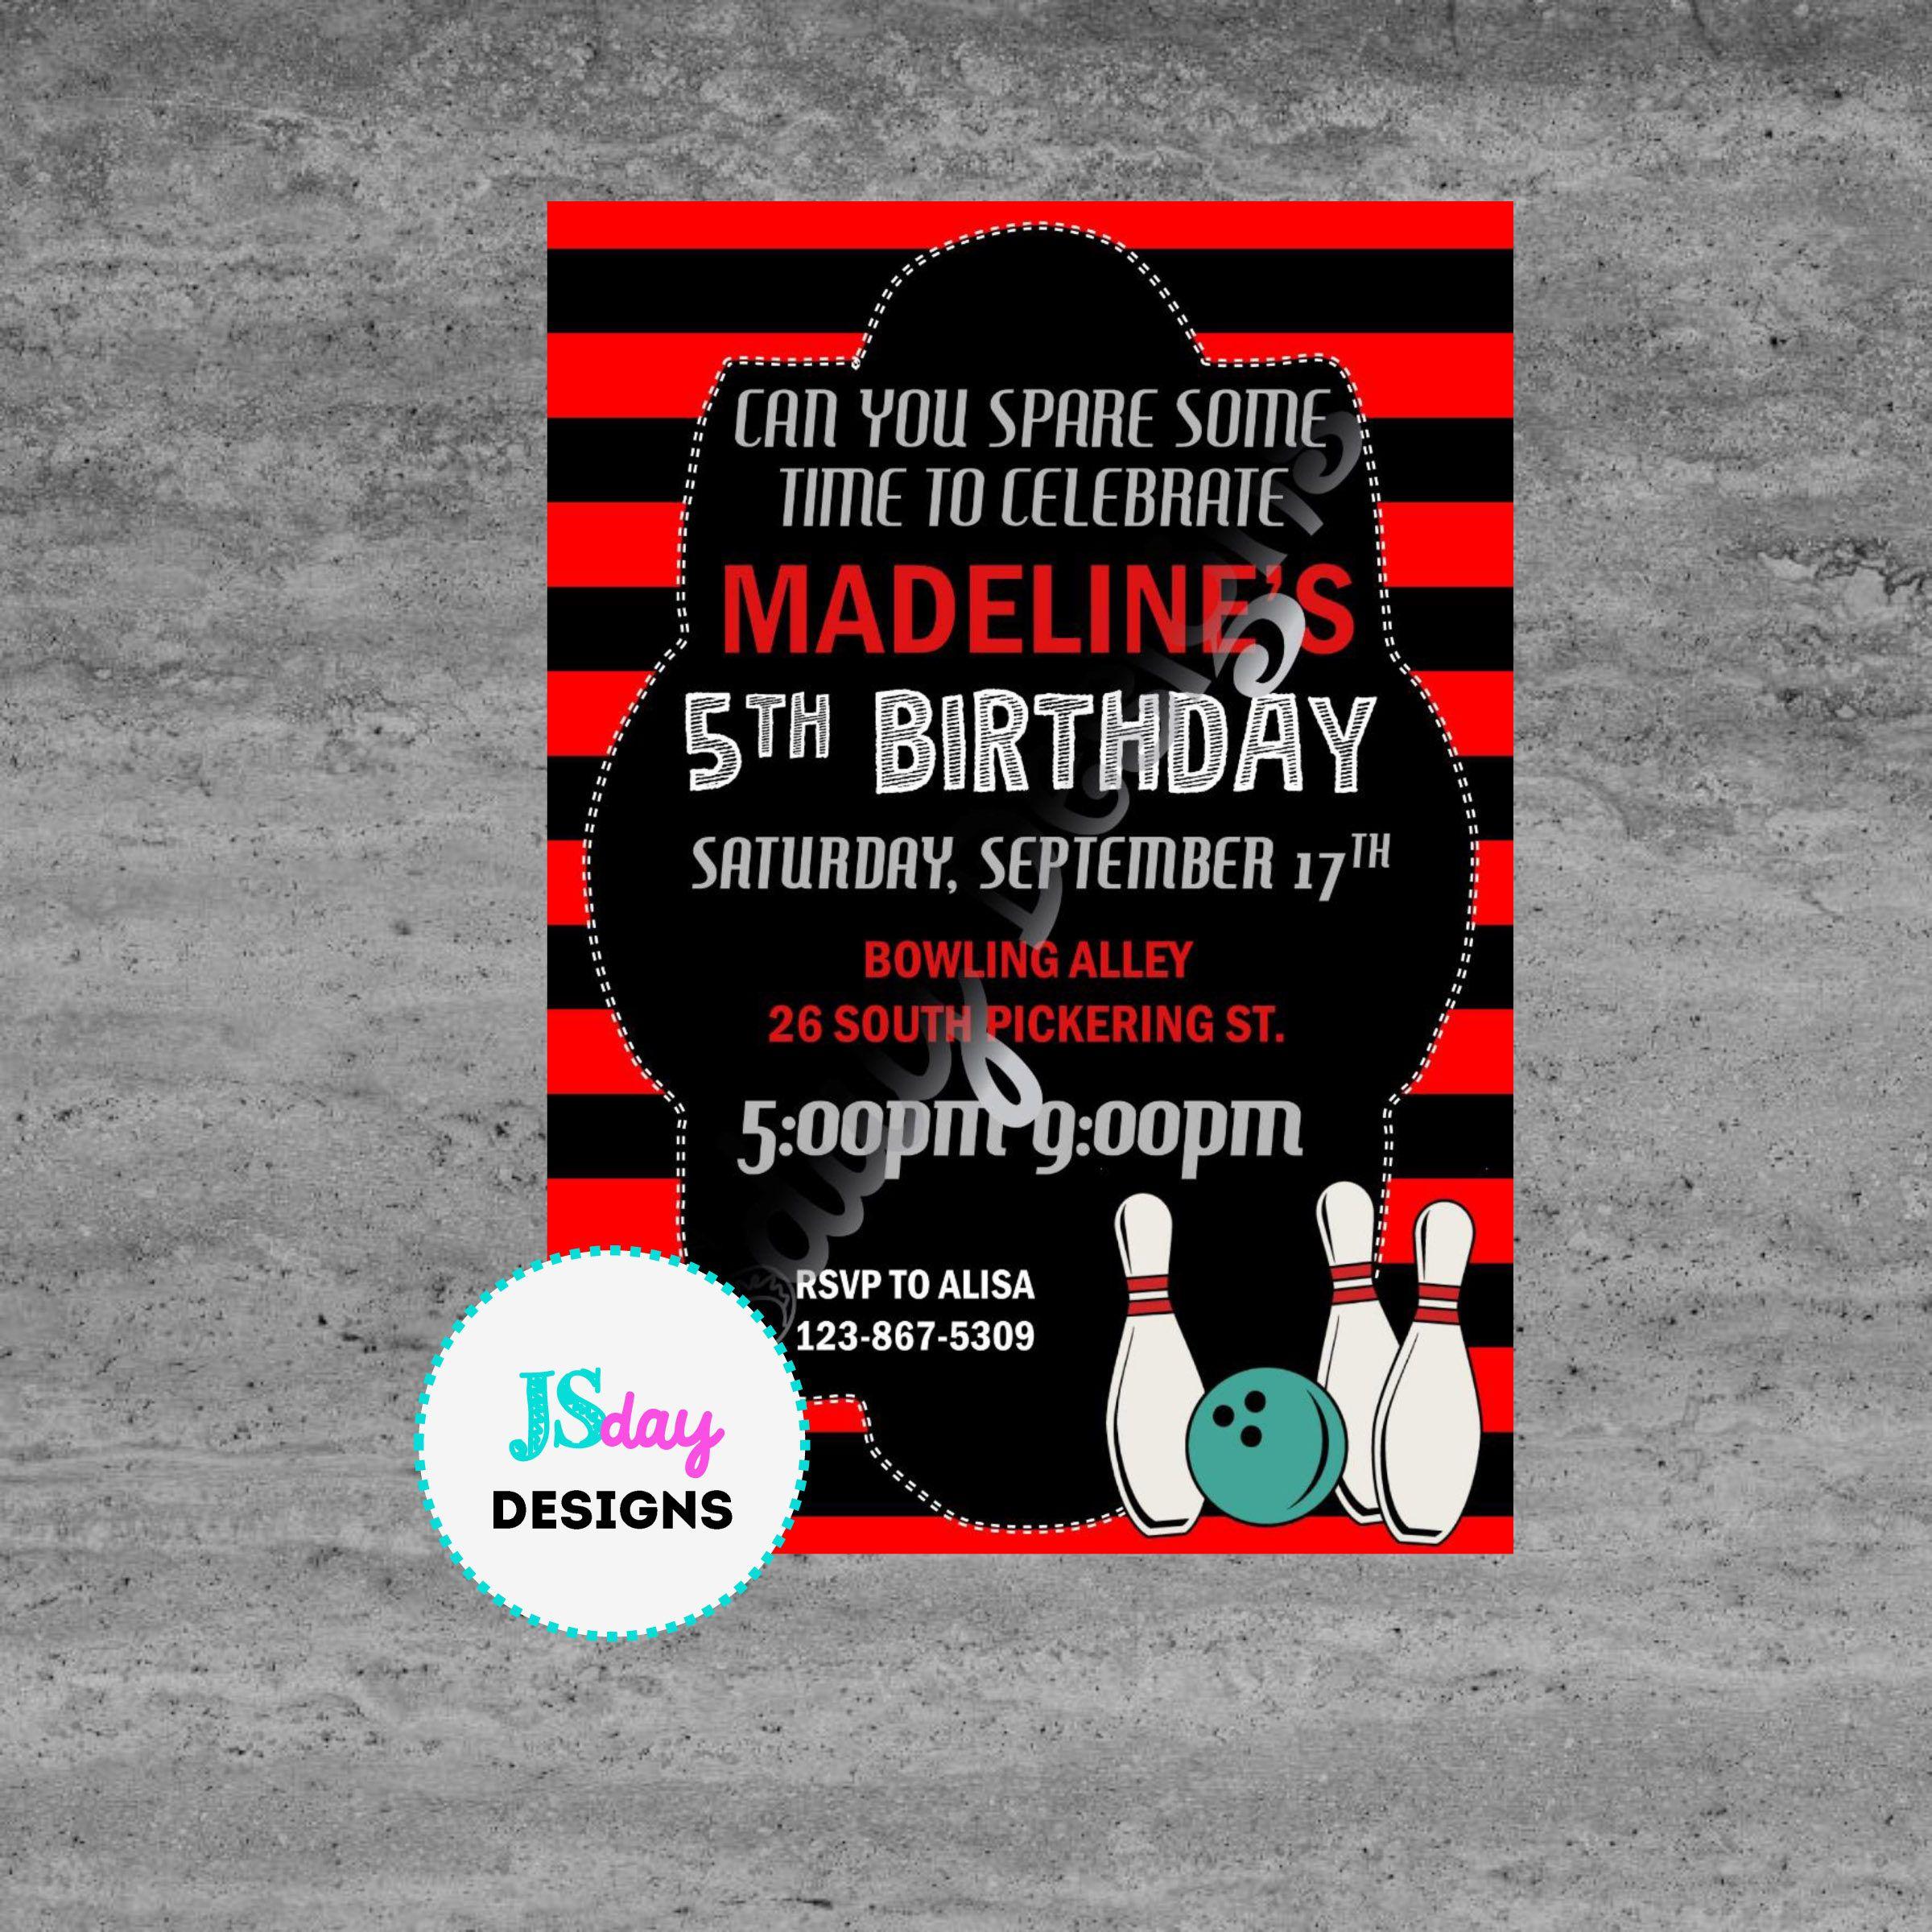 Fine Tween Party Invitations Crest - Resume Ideas - megansmission.info